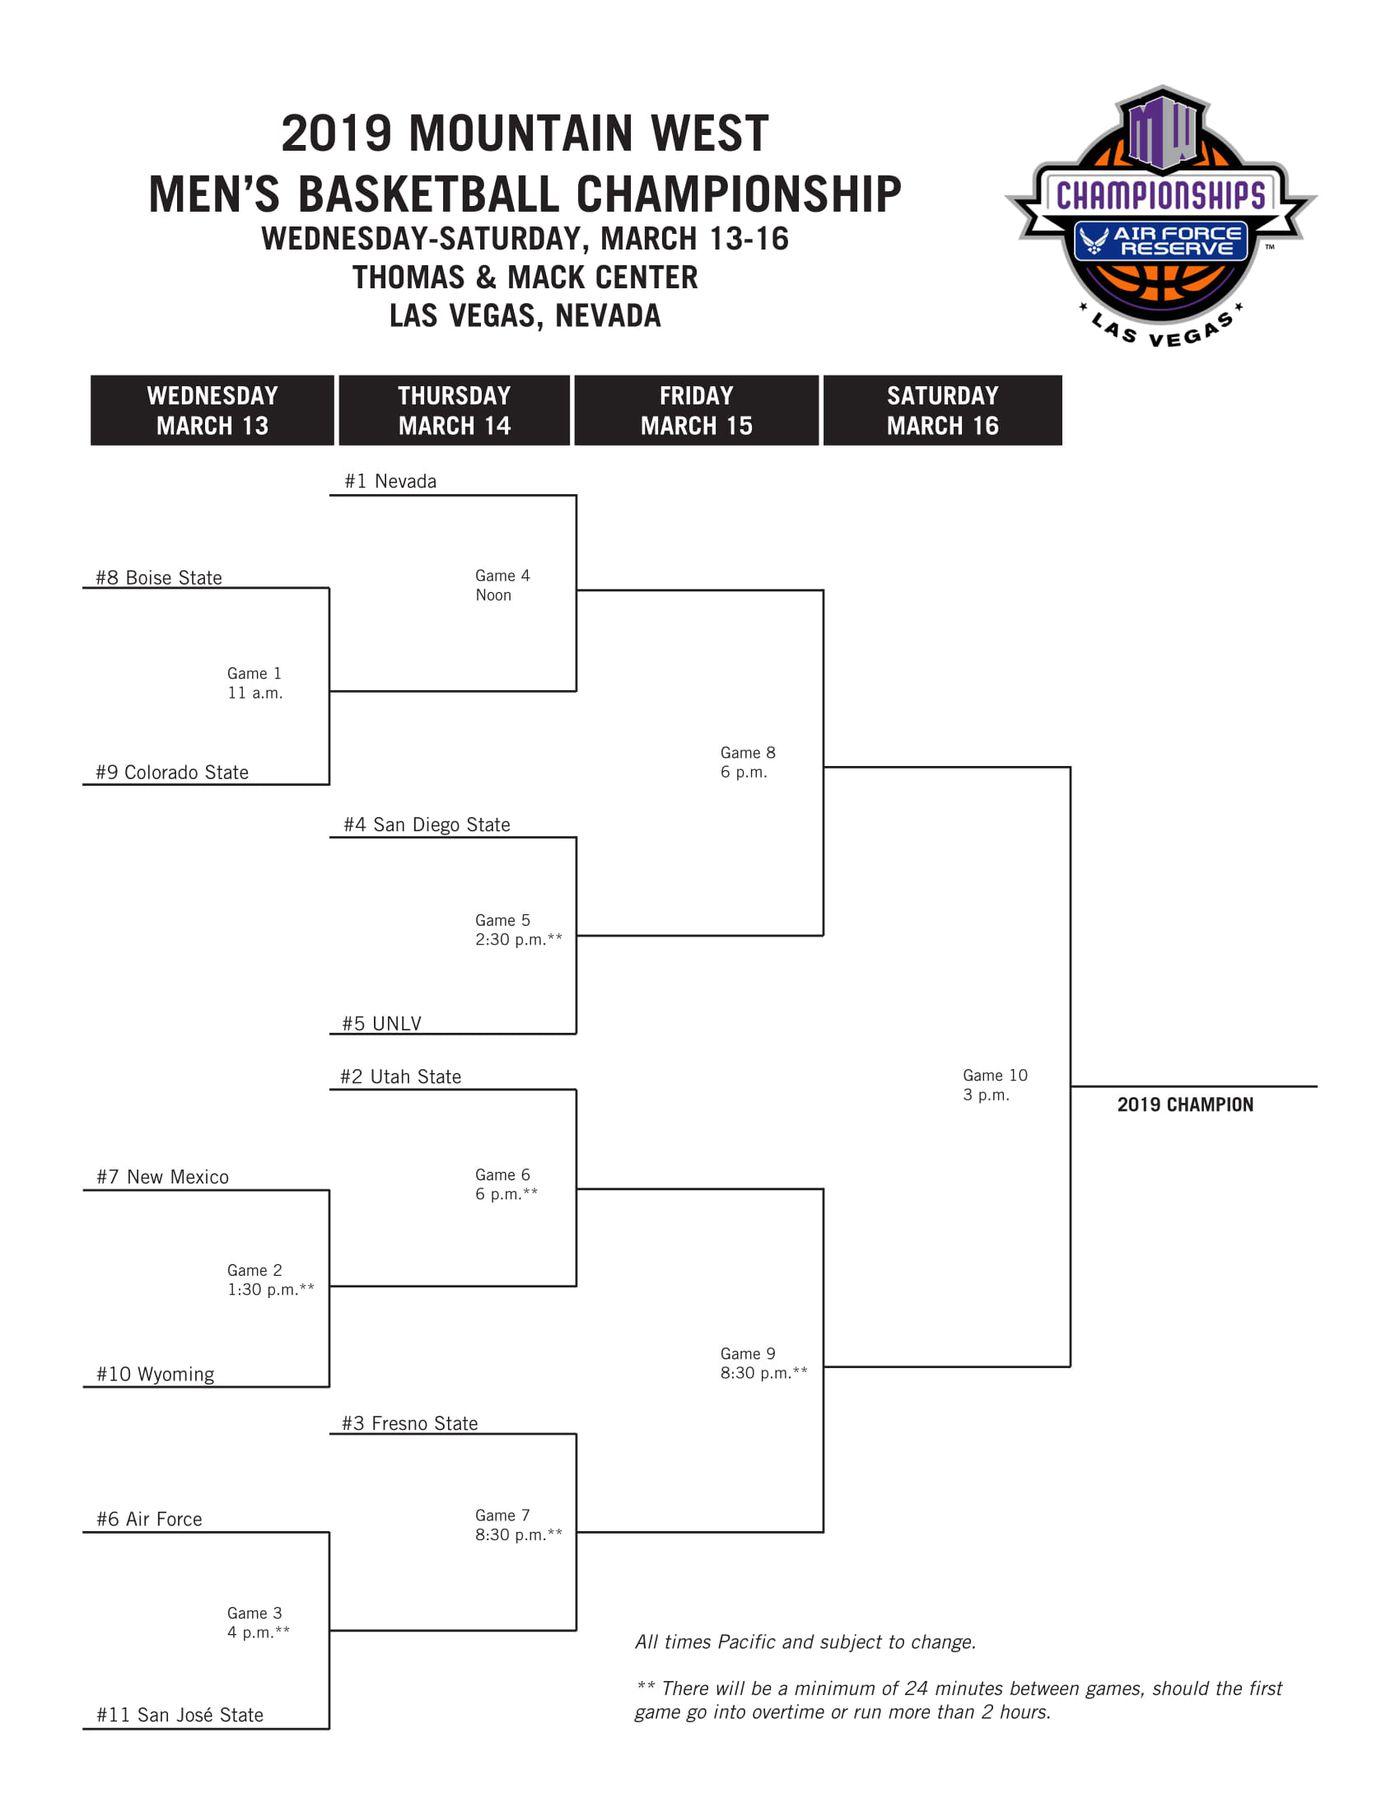 Mountain West tournament 2019: Bracket, schedule, and scores